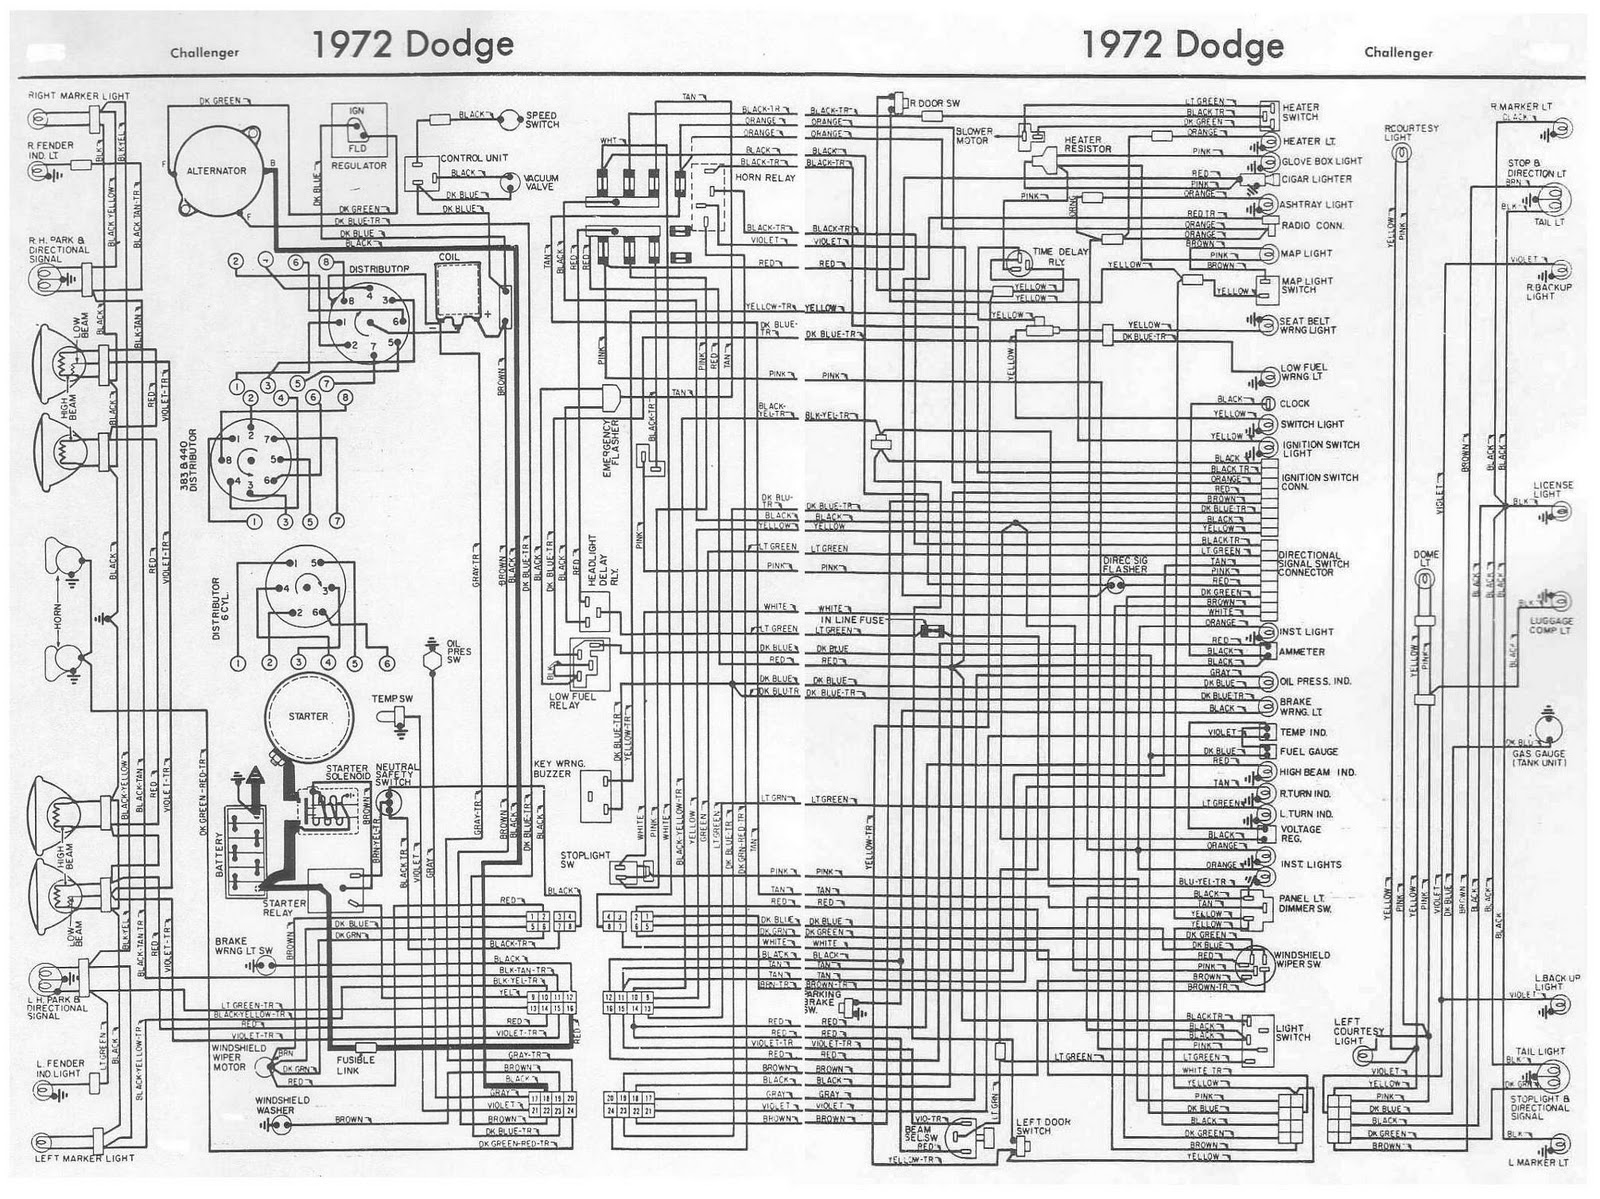 1973 dodge w200 wiring diagram